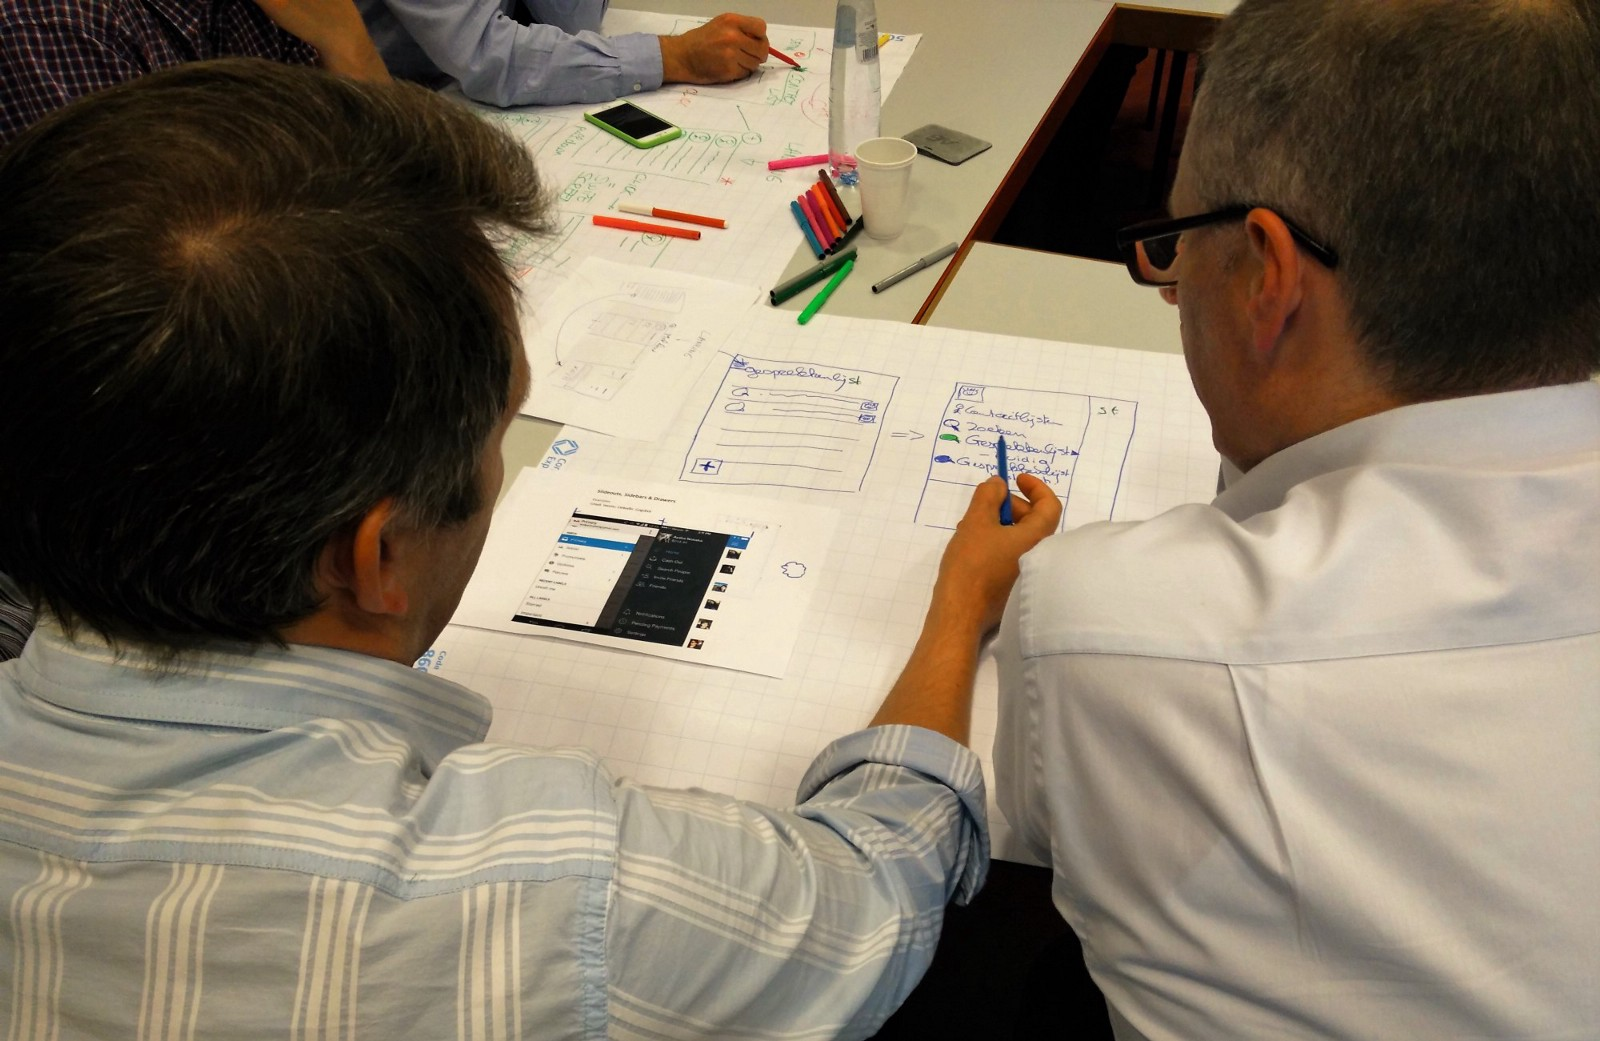 Workshop participants copying patterns using a shortlist of core features.